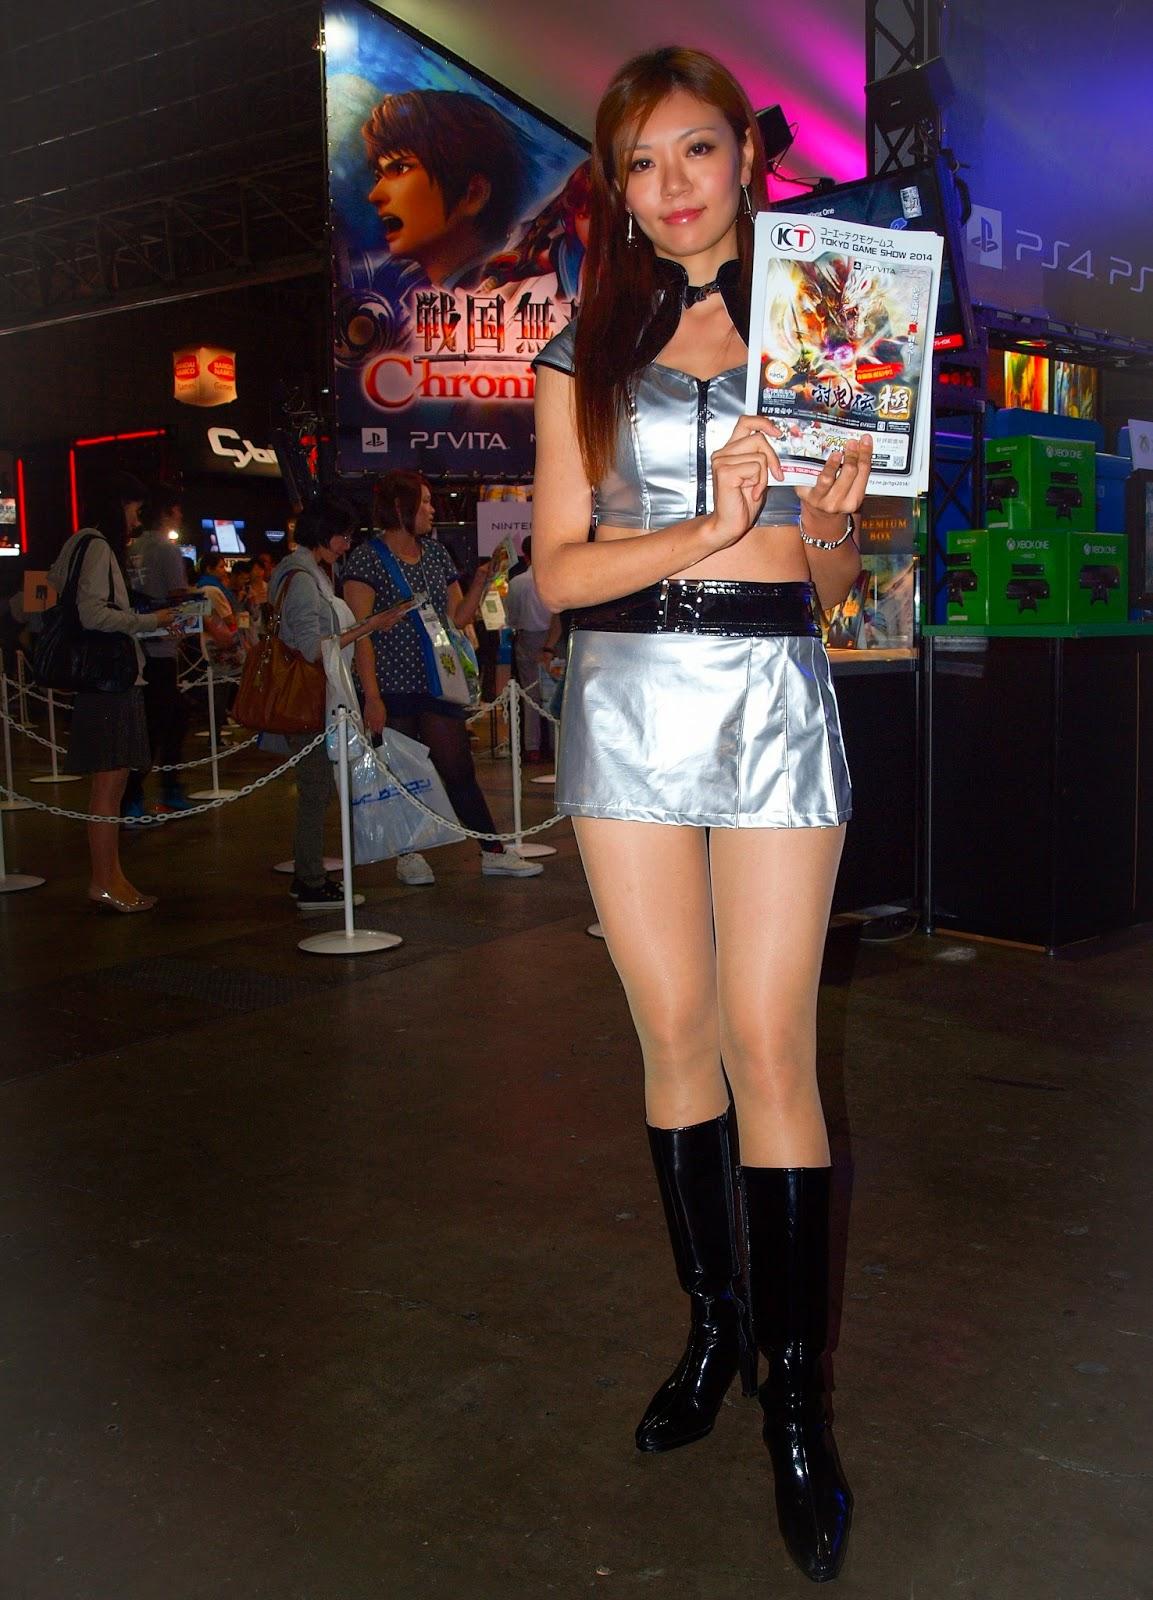 Tecmo Koei model